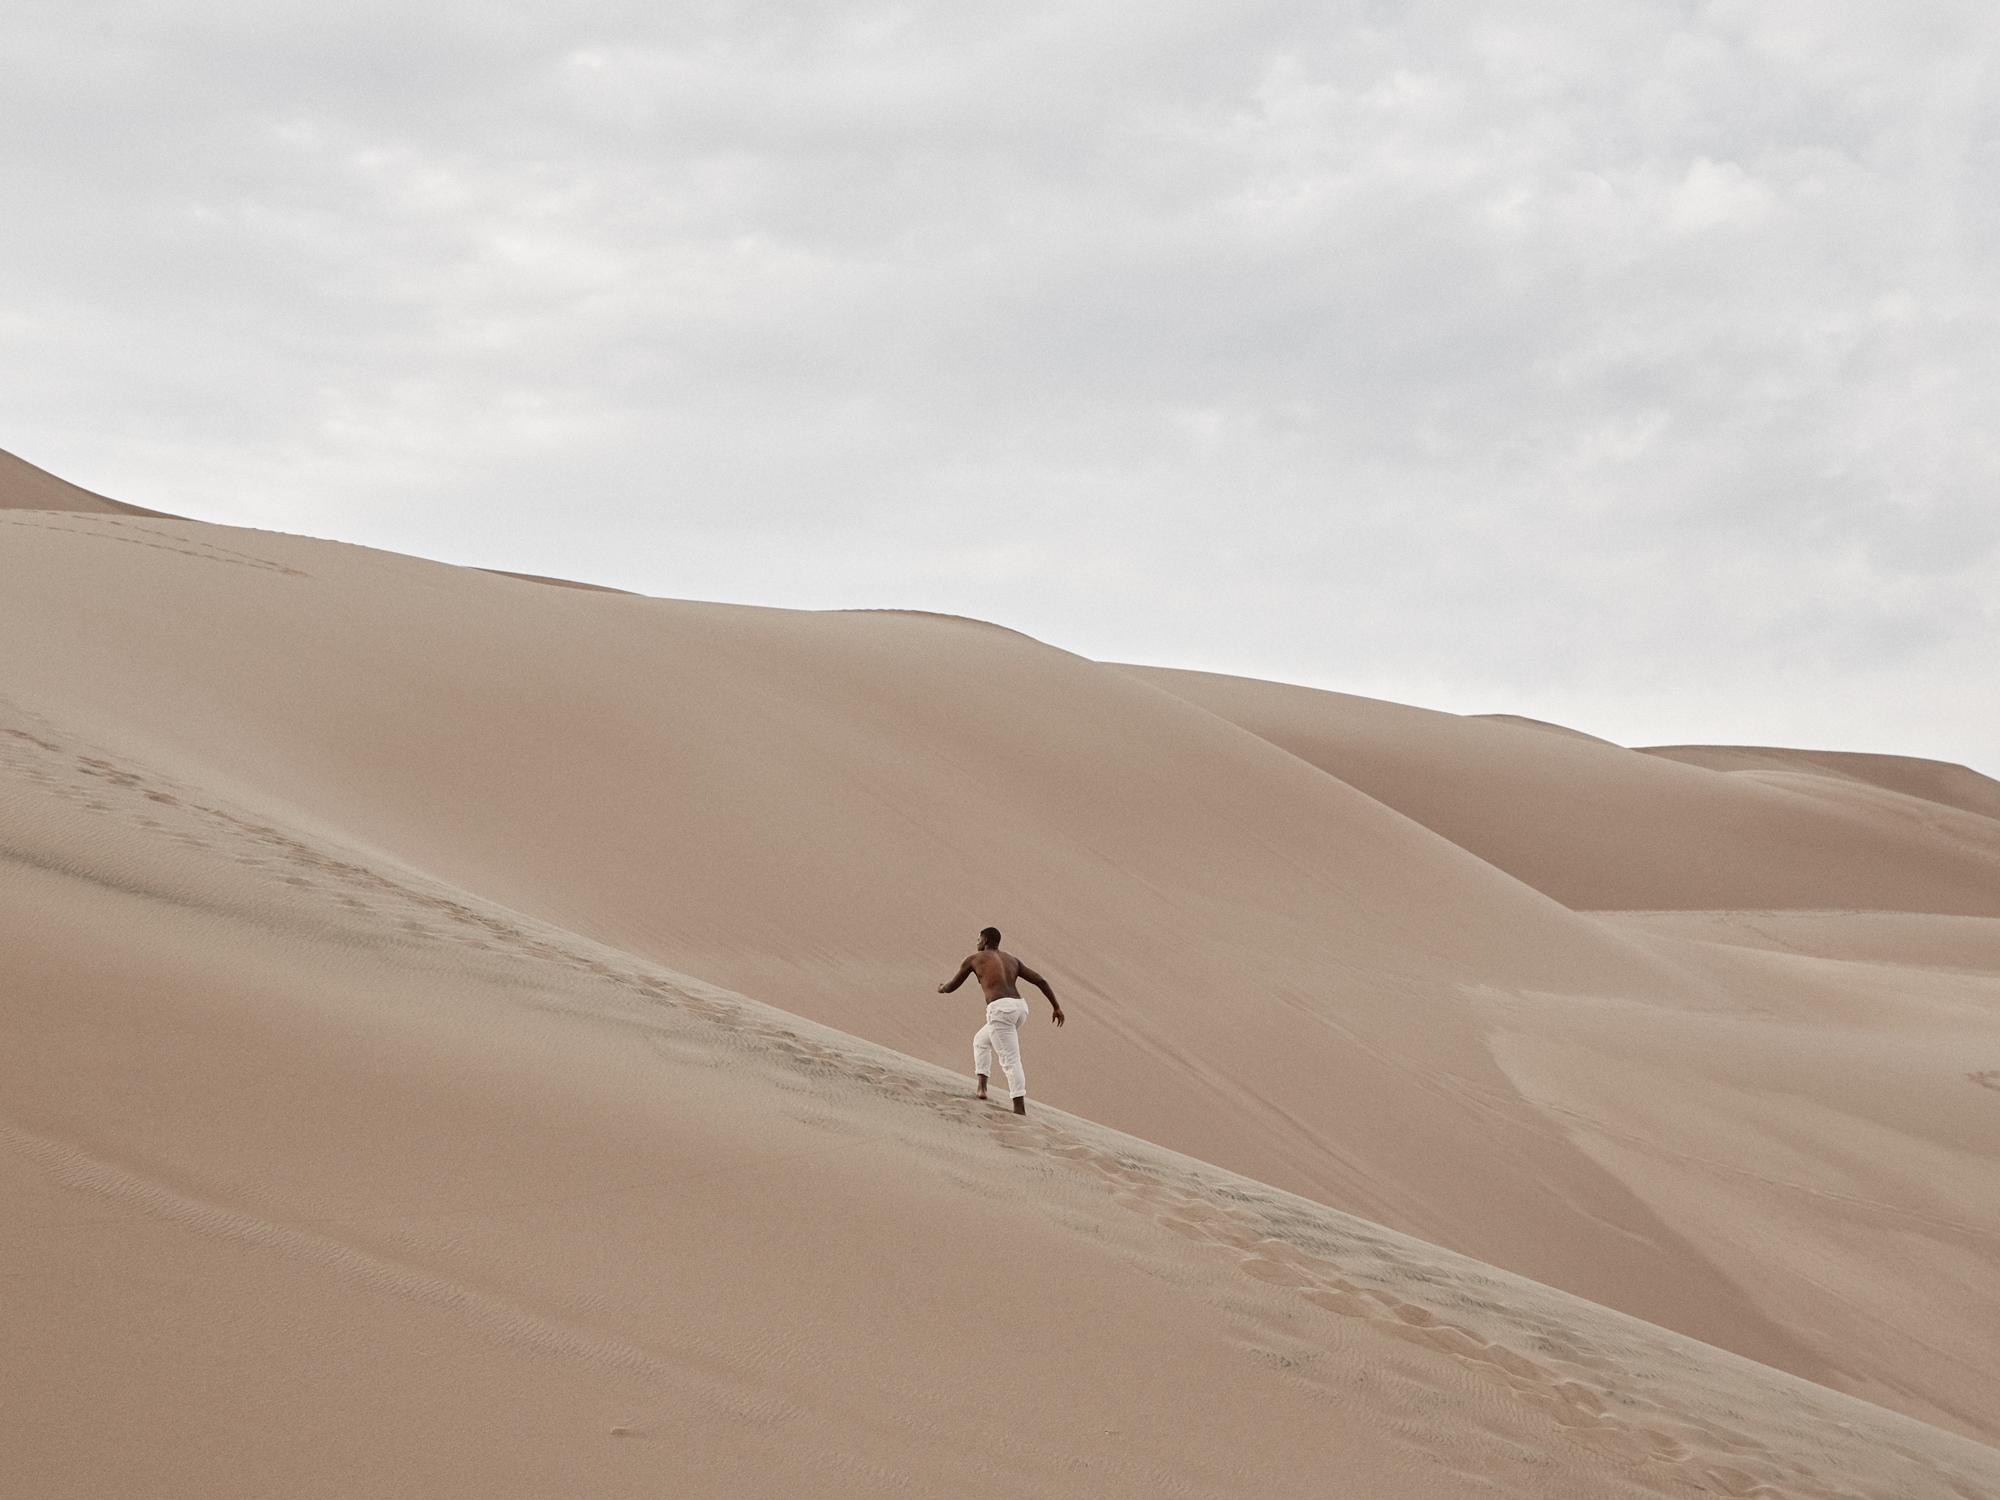 Dune-07.jpg